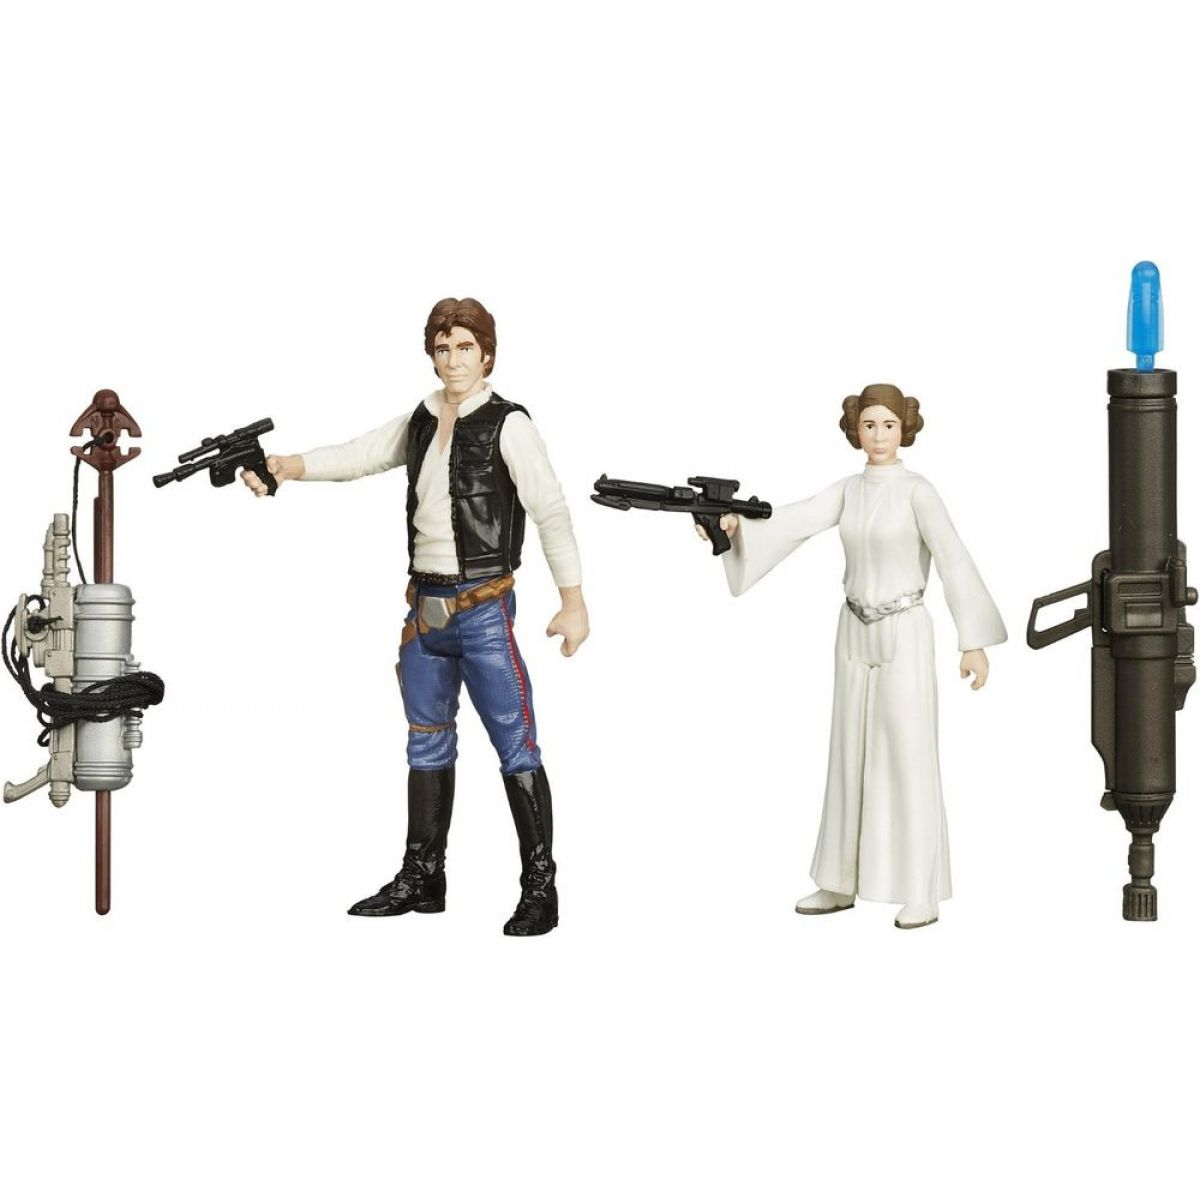 Hasbro Star Wars Epizoda 7 Dvojbalení figurek - Han Solo a Princess Leia